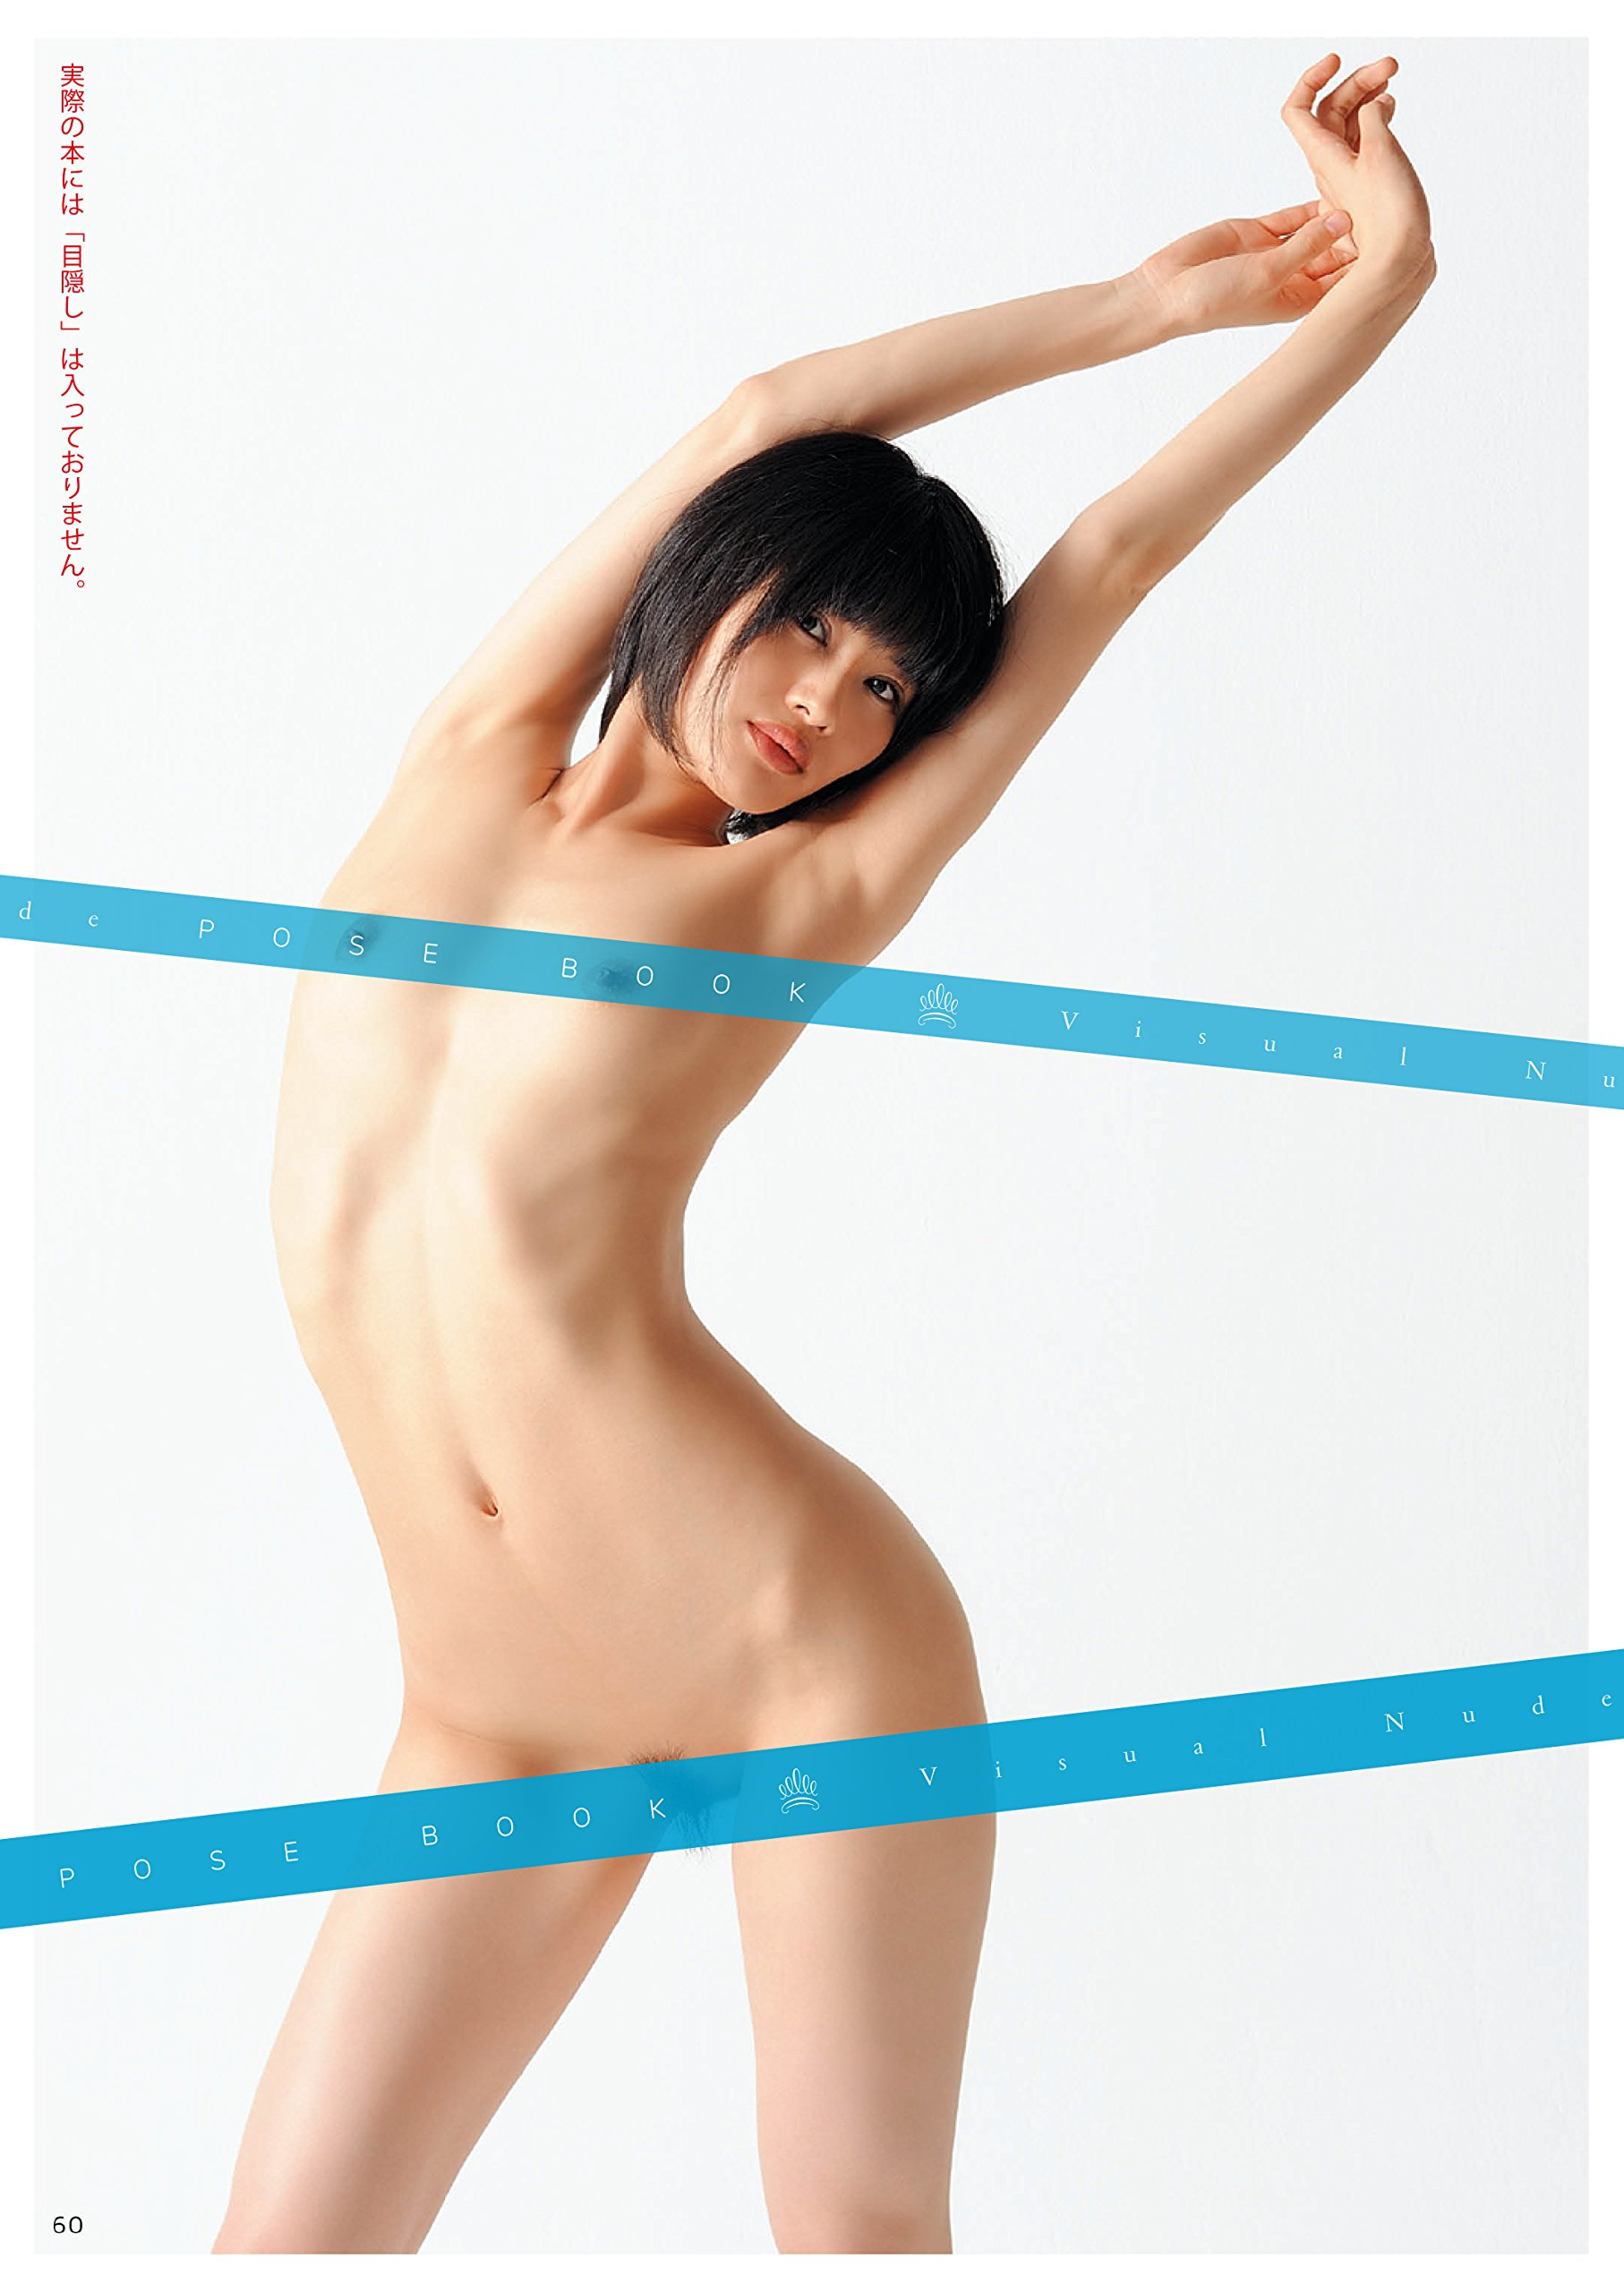 Otsuki hibiki book nude sexual act pose